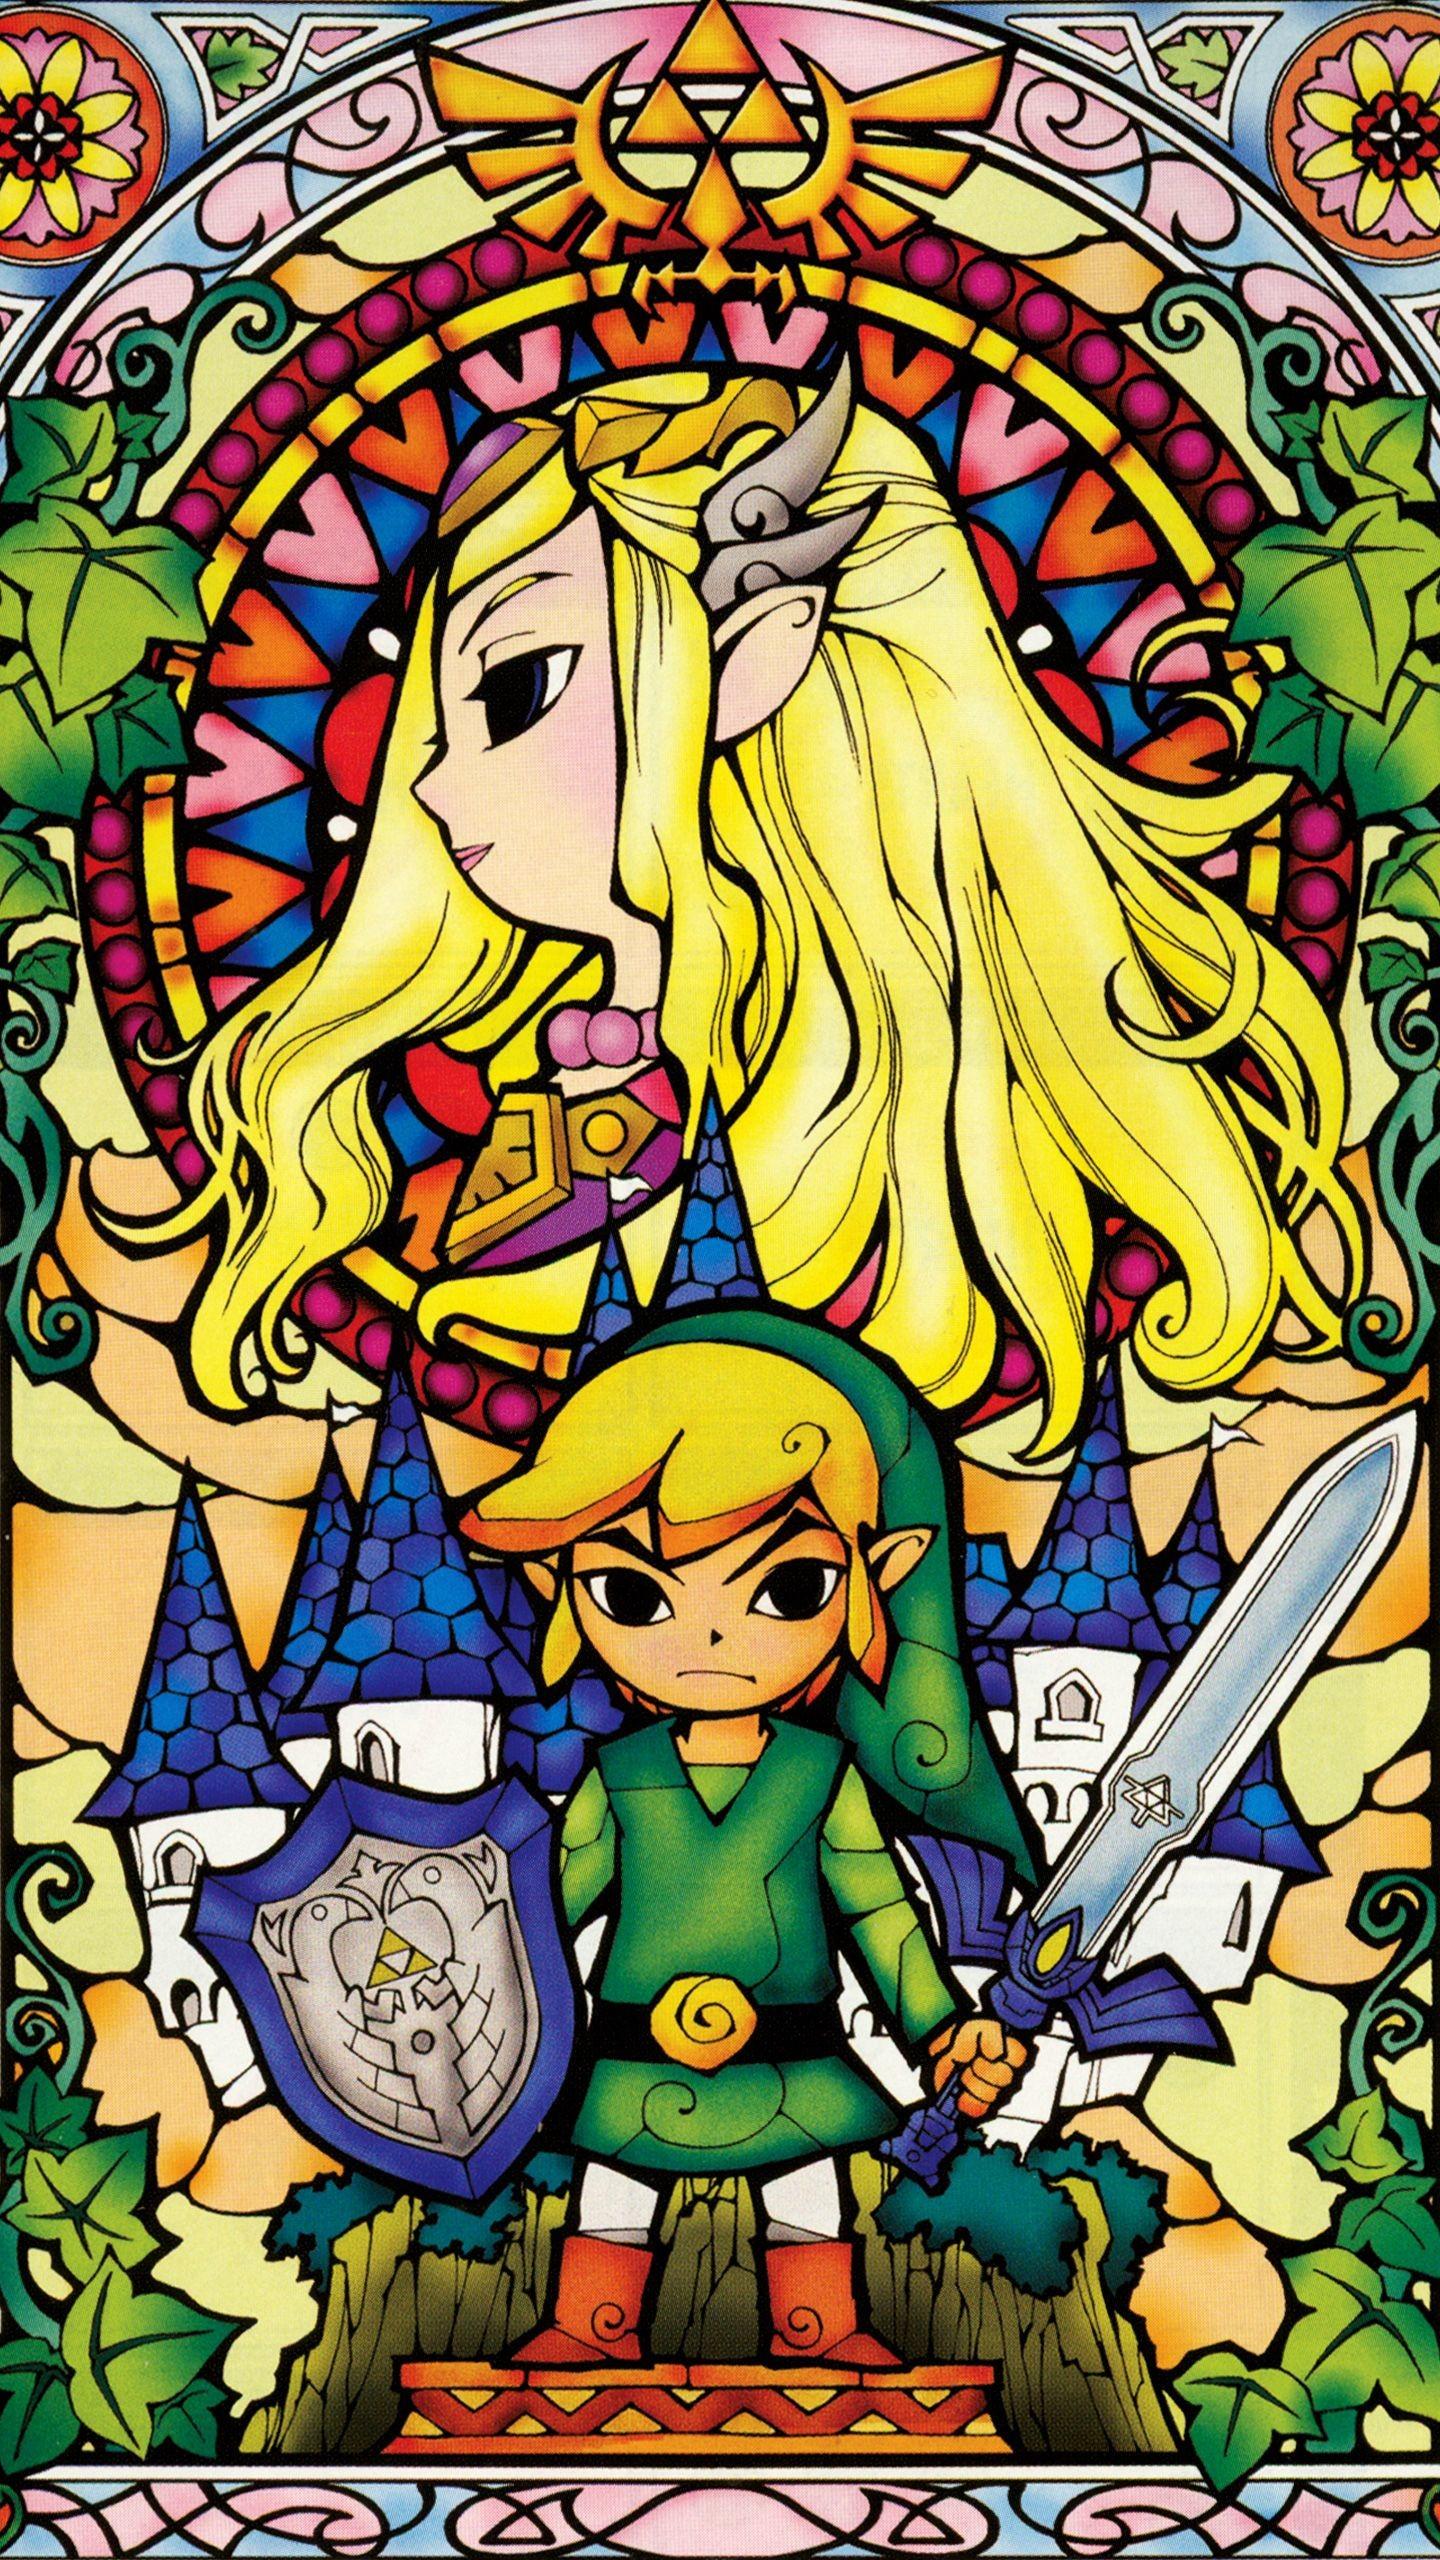 Res: 1440x2560, Triforce The Legend of Zelda HD desktop wallpaper High Free